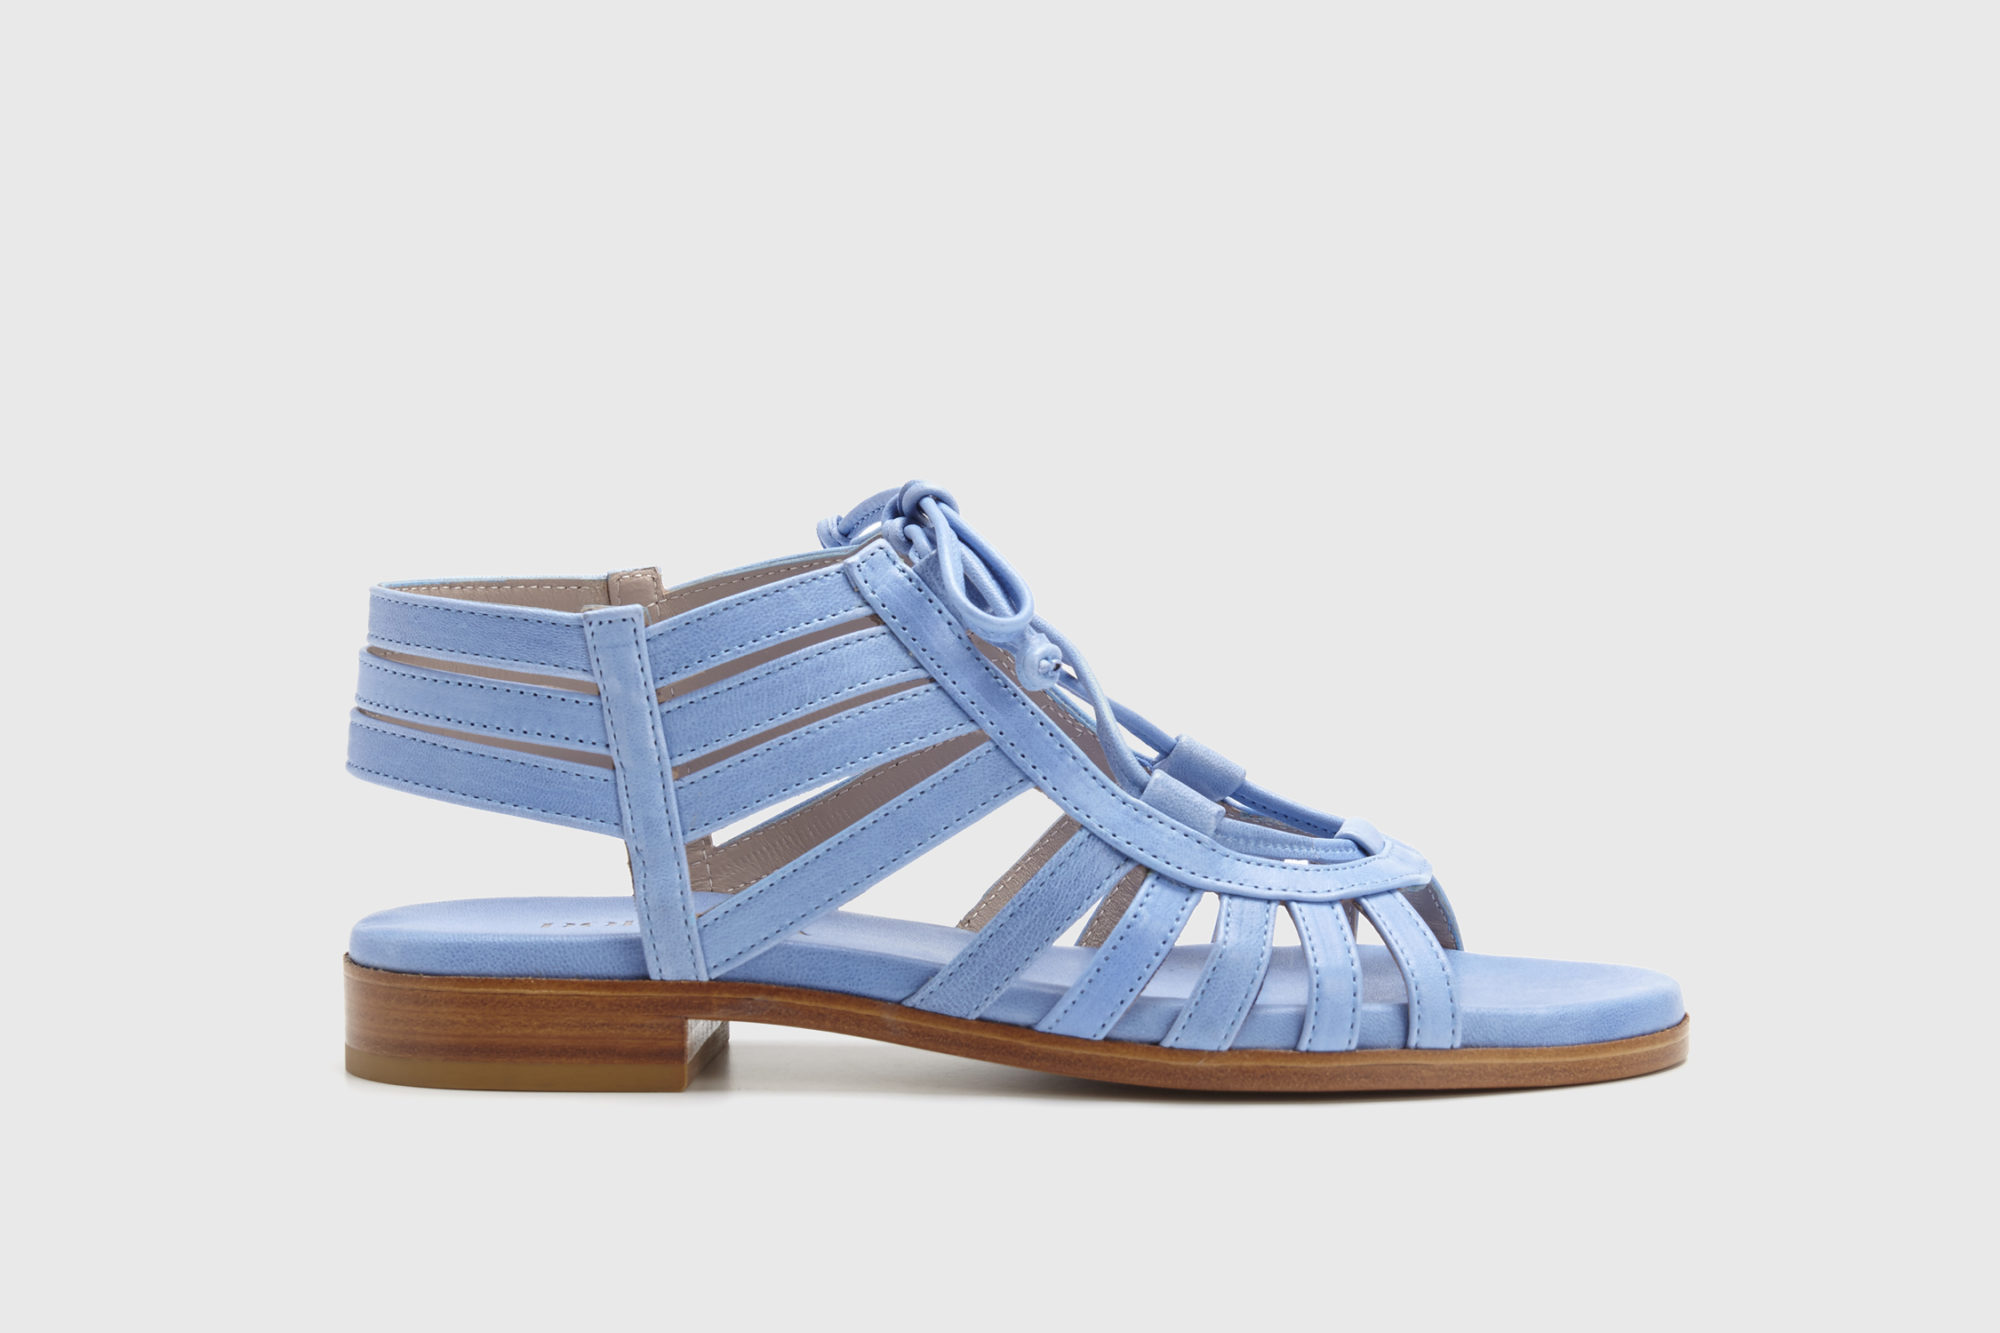 Dorotea sandalia plana Margot azul ss17 perfil